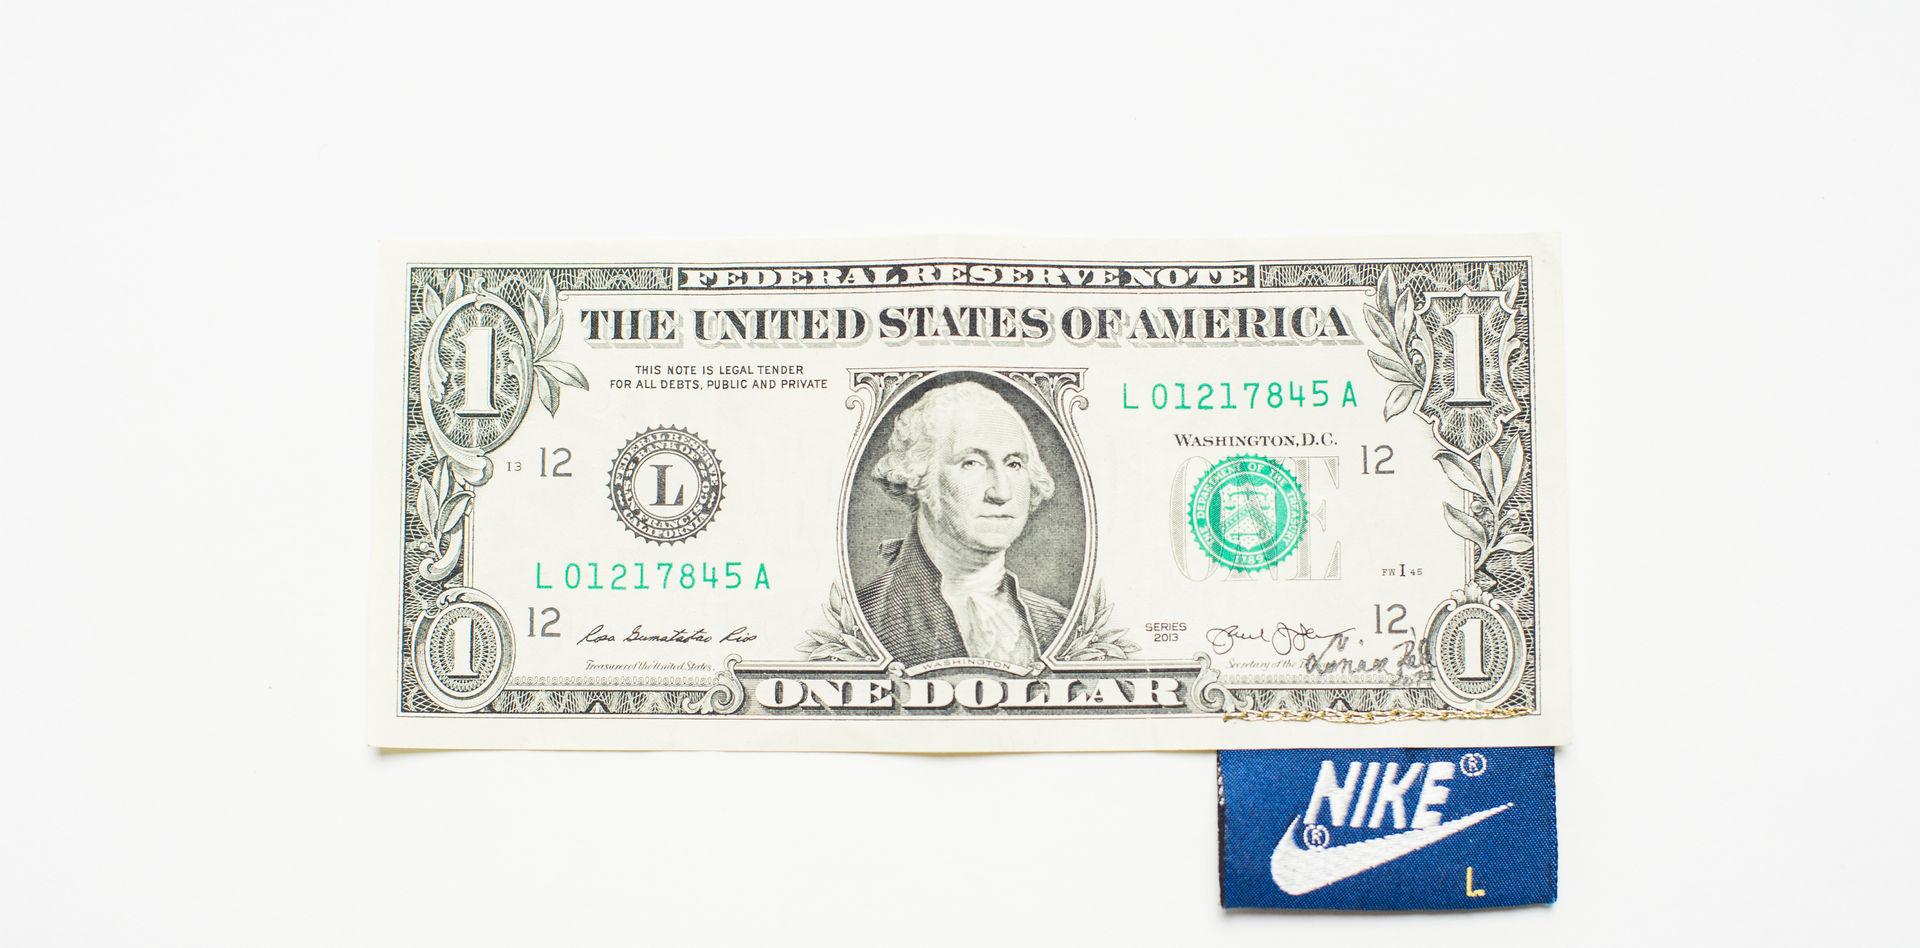 My Money – NIKE